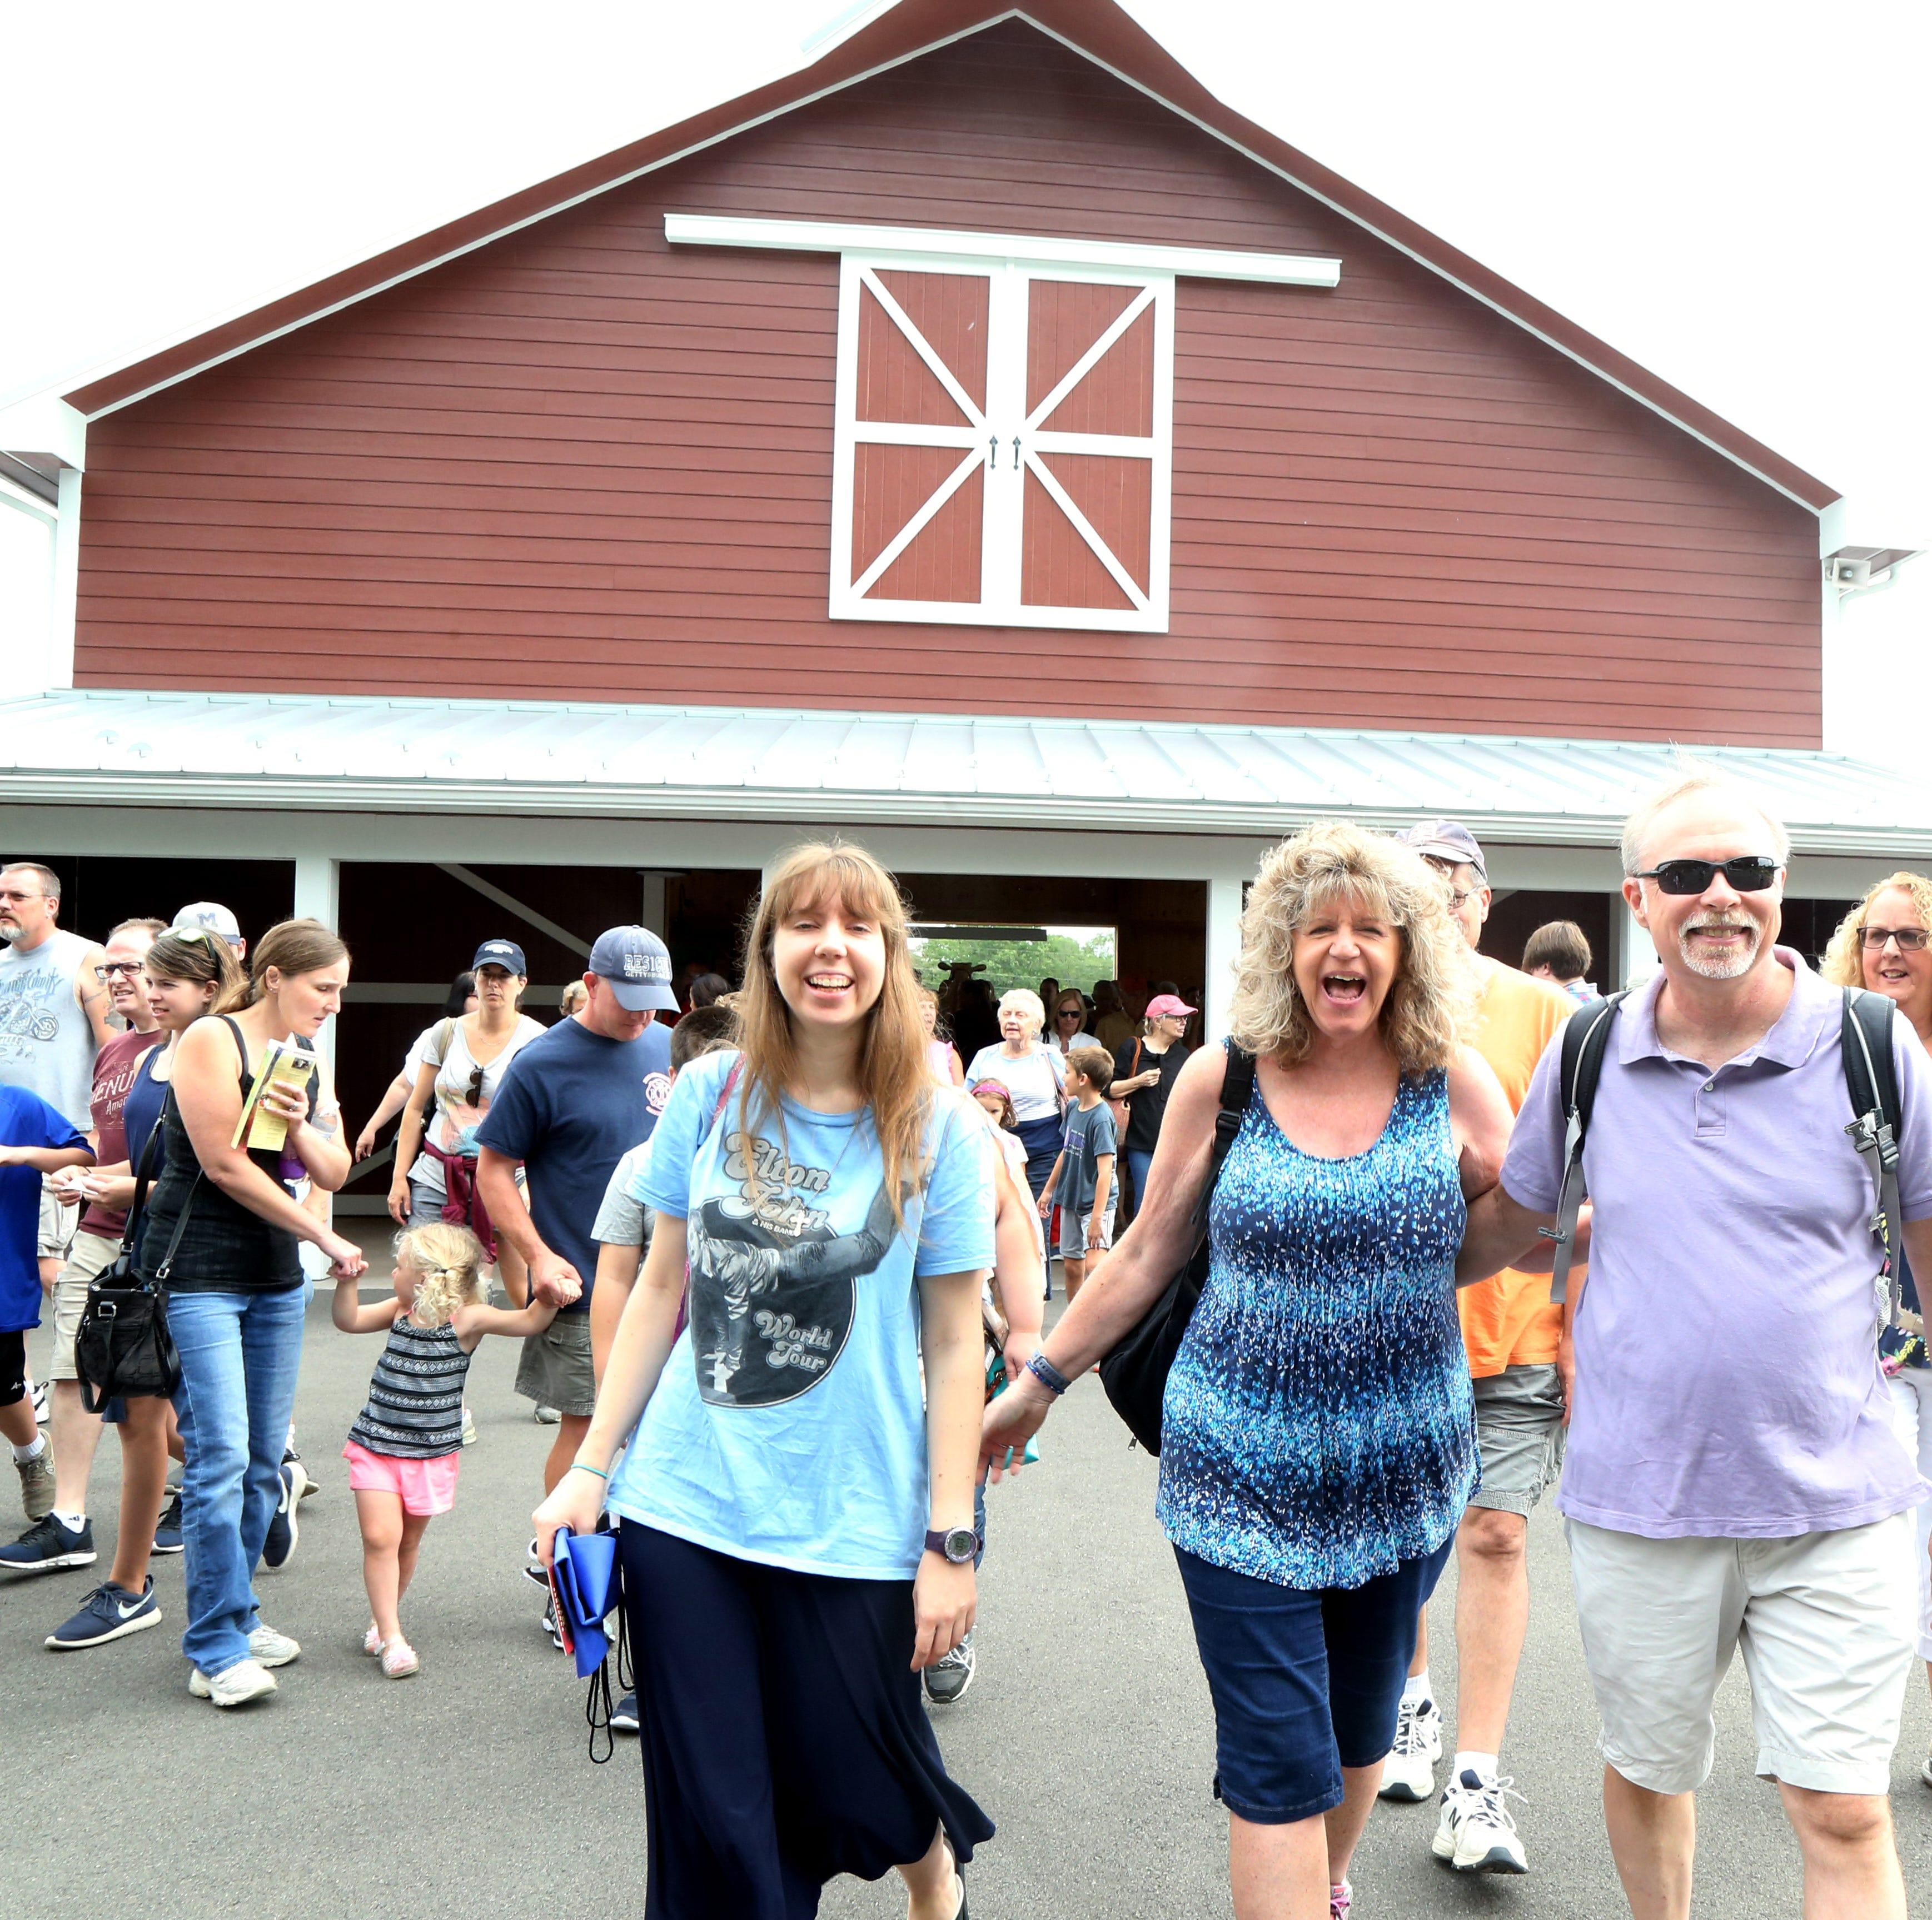 Dutchess County Fair opens, renewing summer tradition